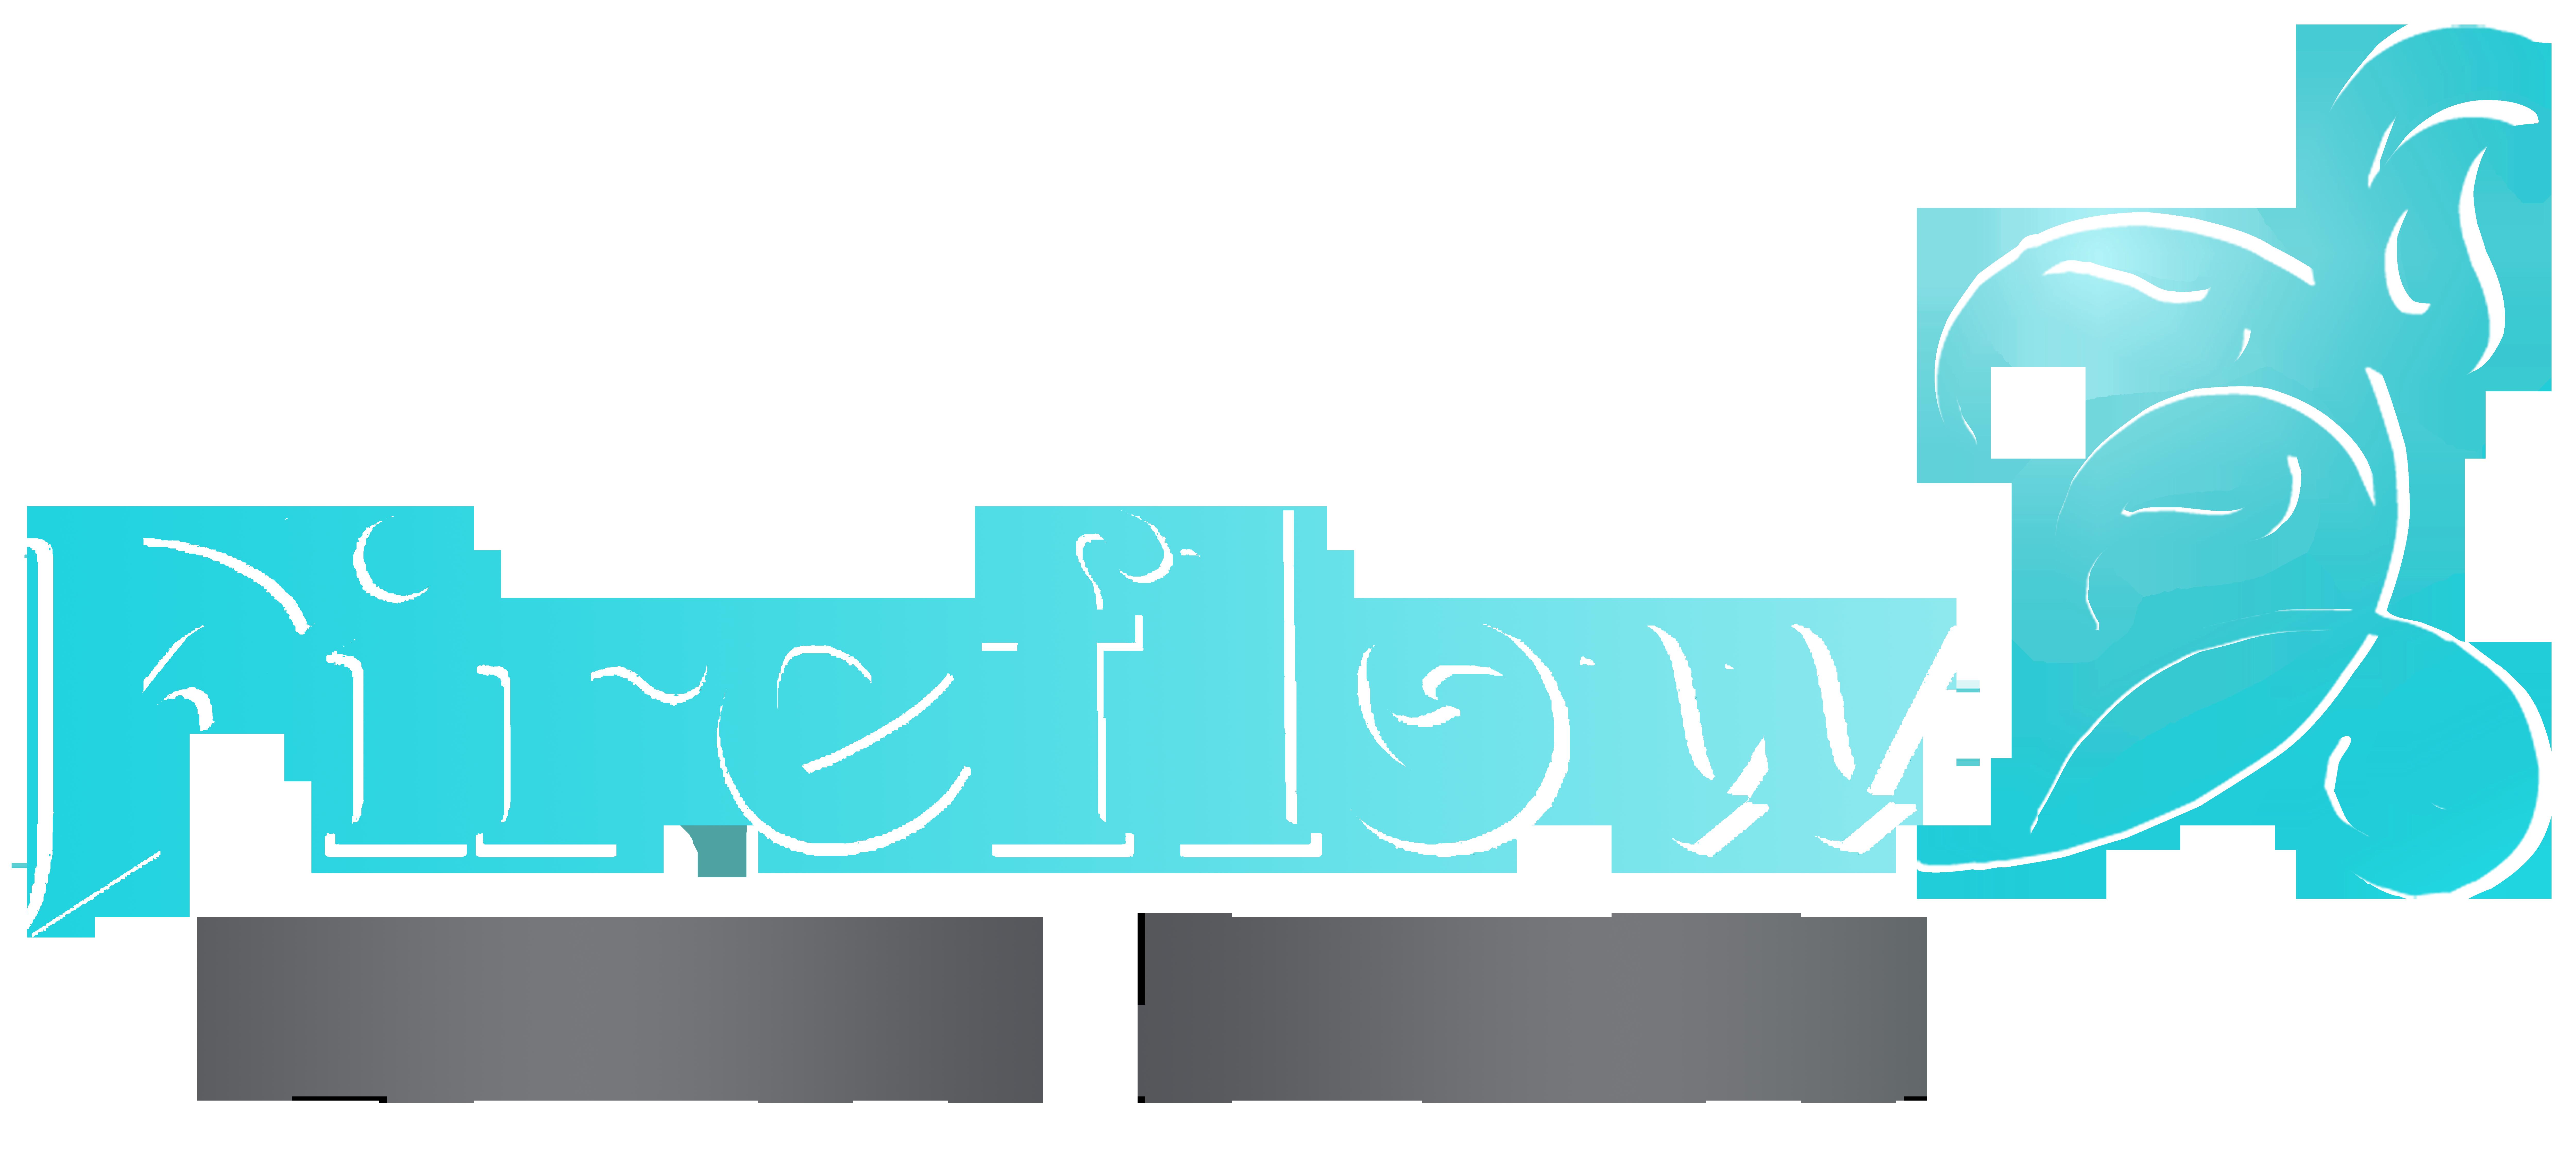 Fireflow Dance Studio